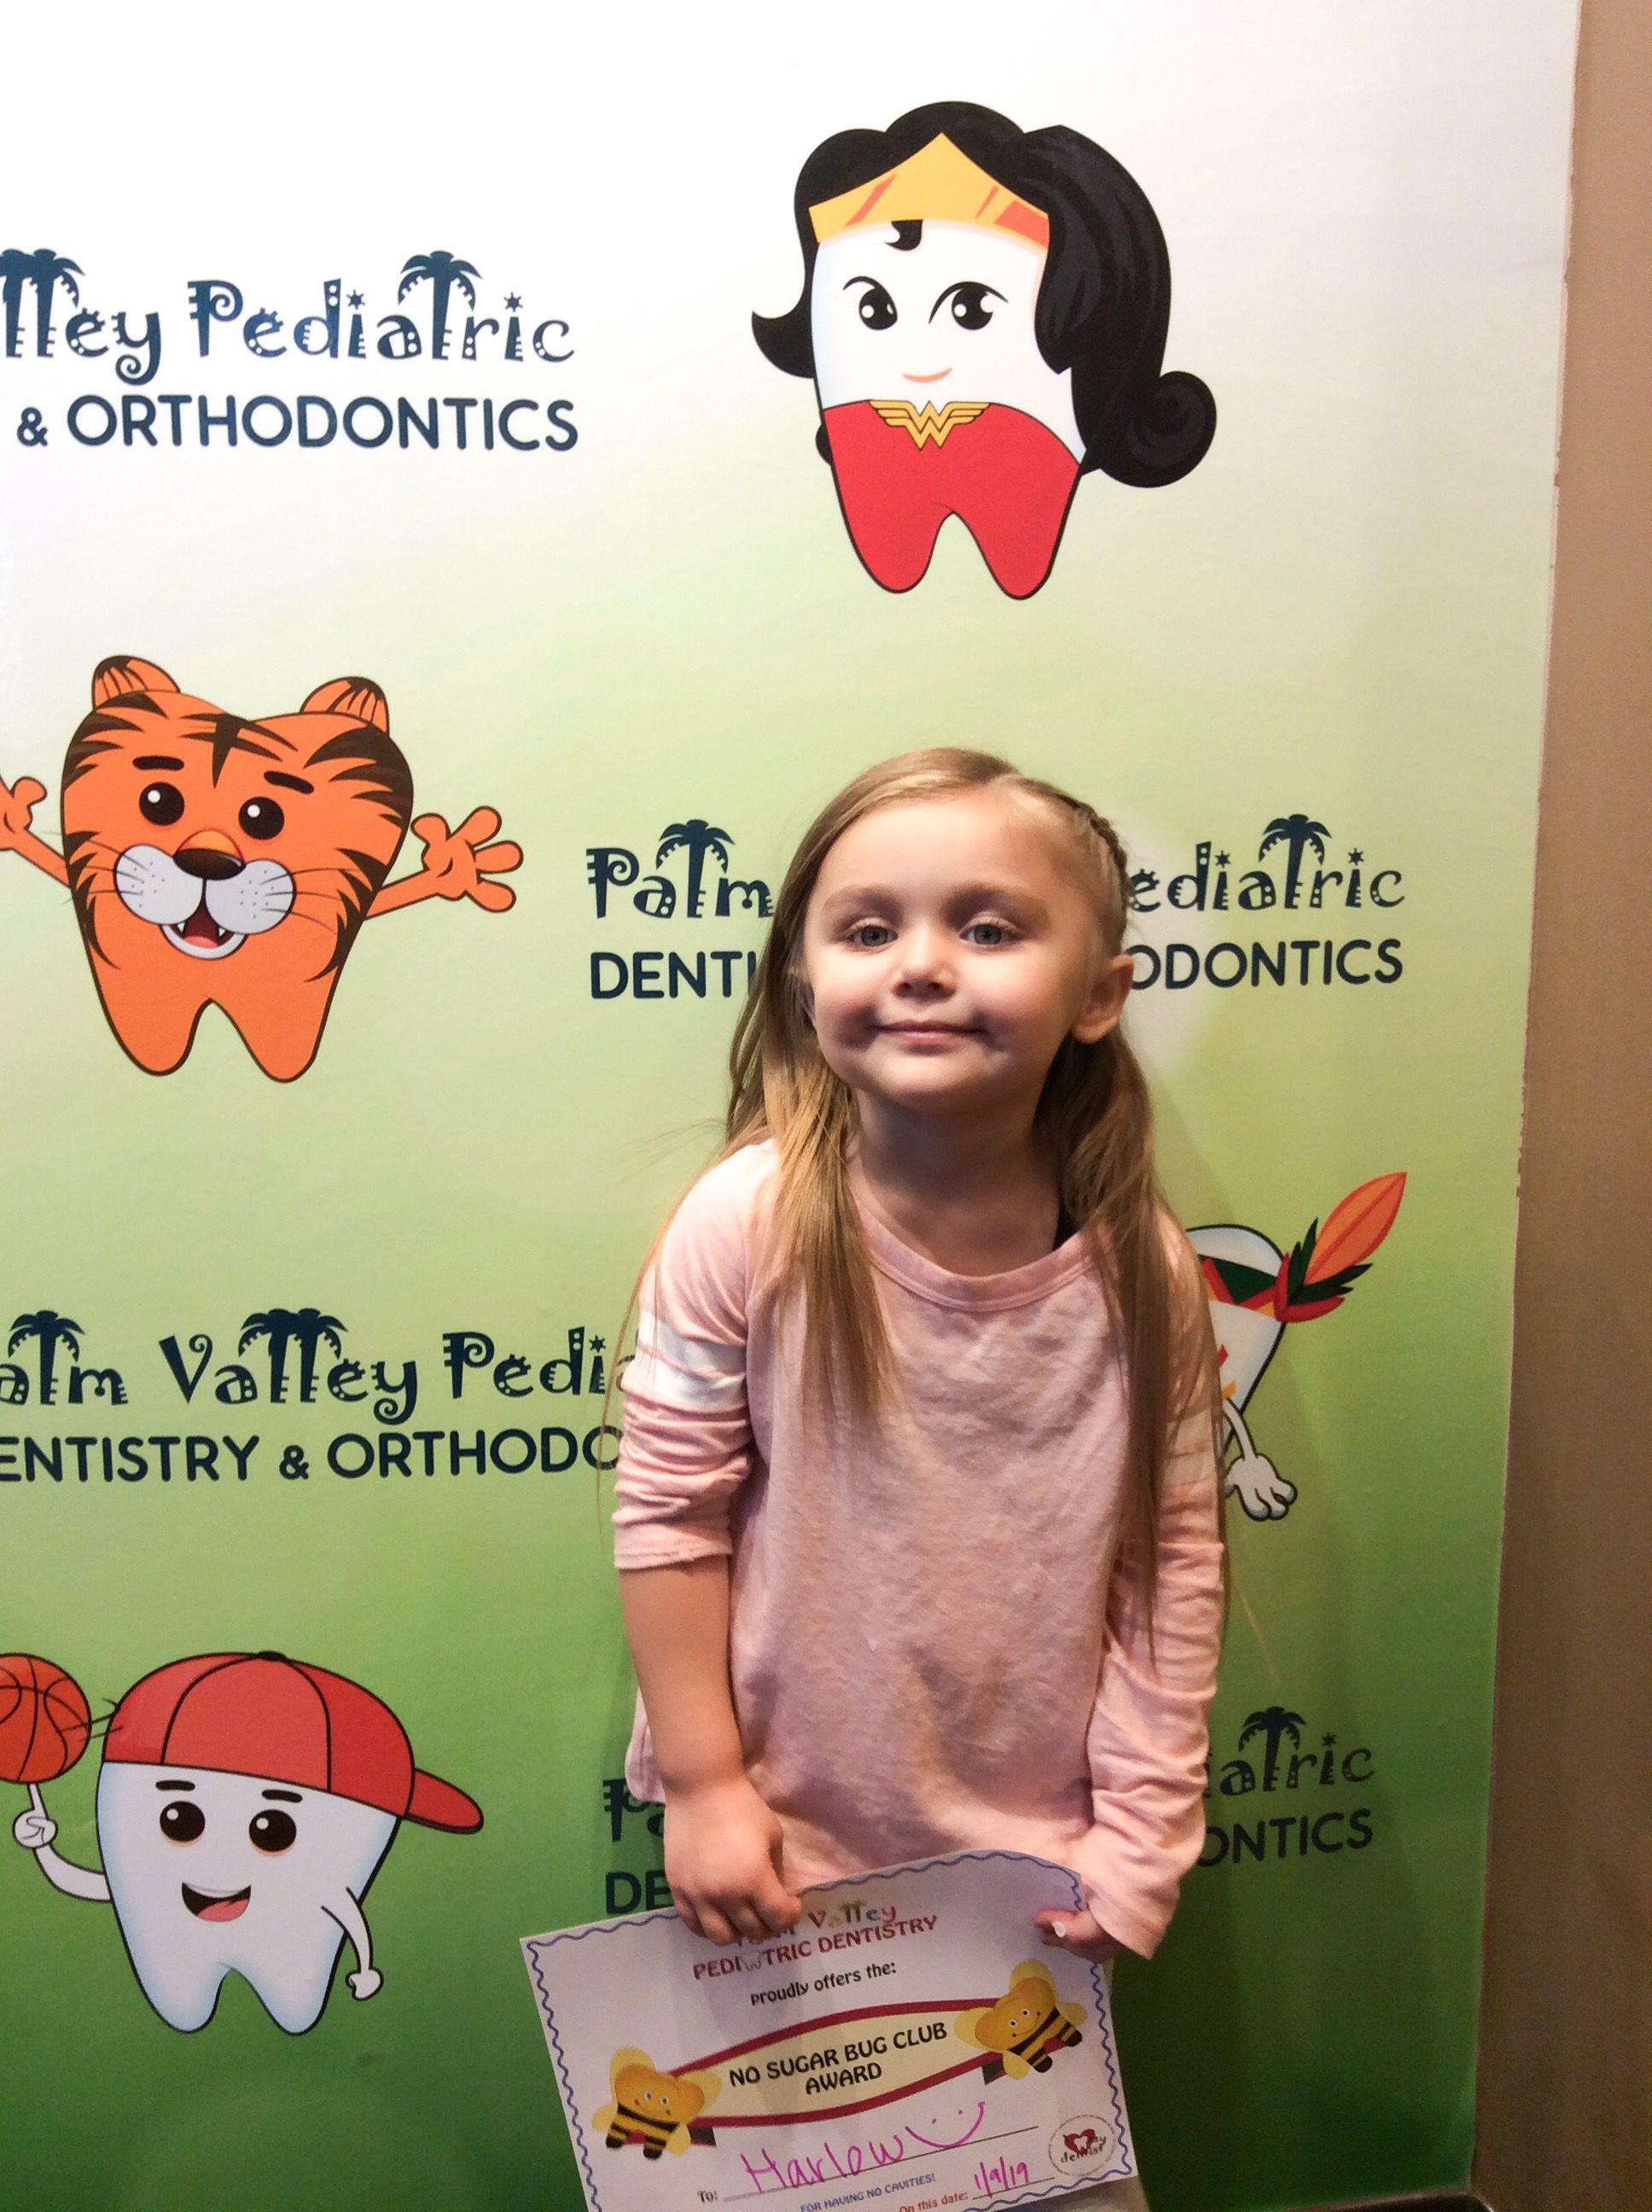 Pvpd palm valley pediatric dentistry orthodontics http